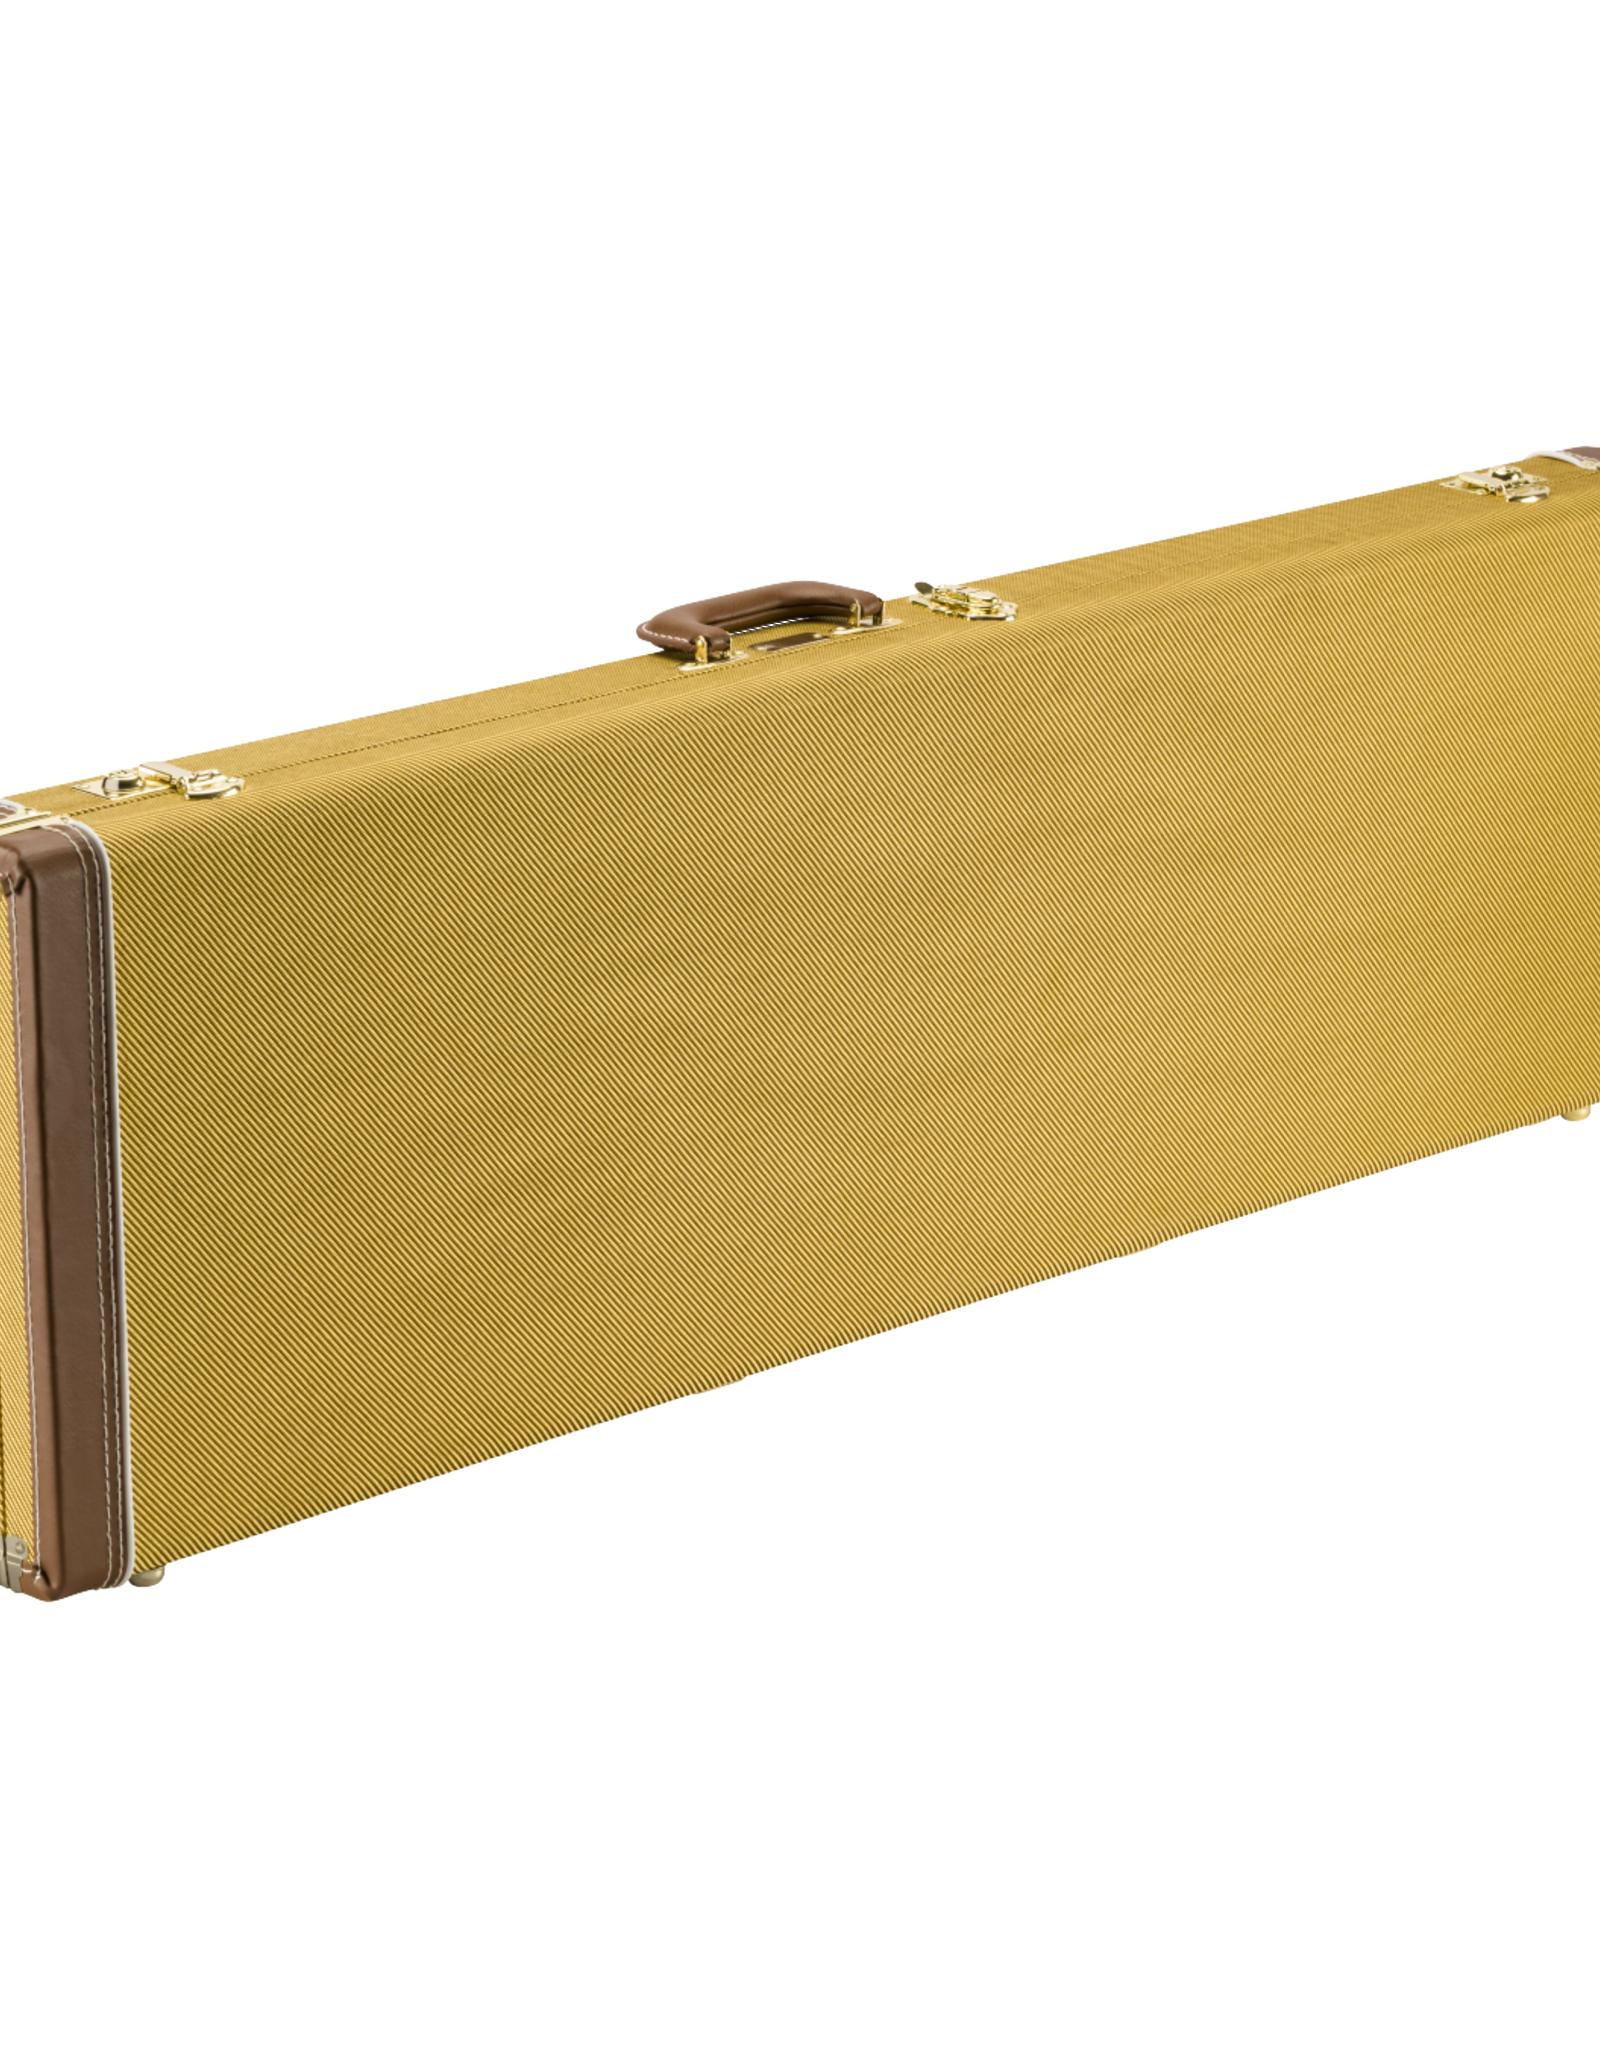 Fender Fender Classic Series Wood Case - P-Bass/Jazz Bass, Tweed